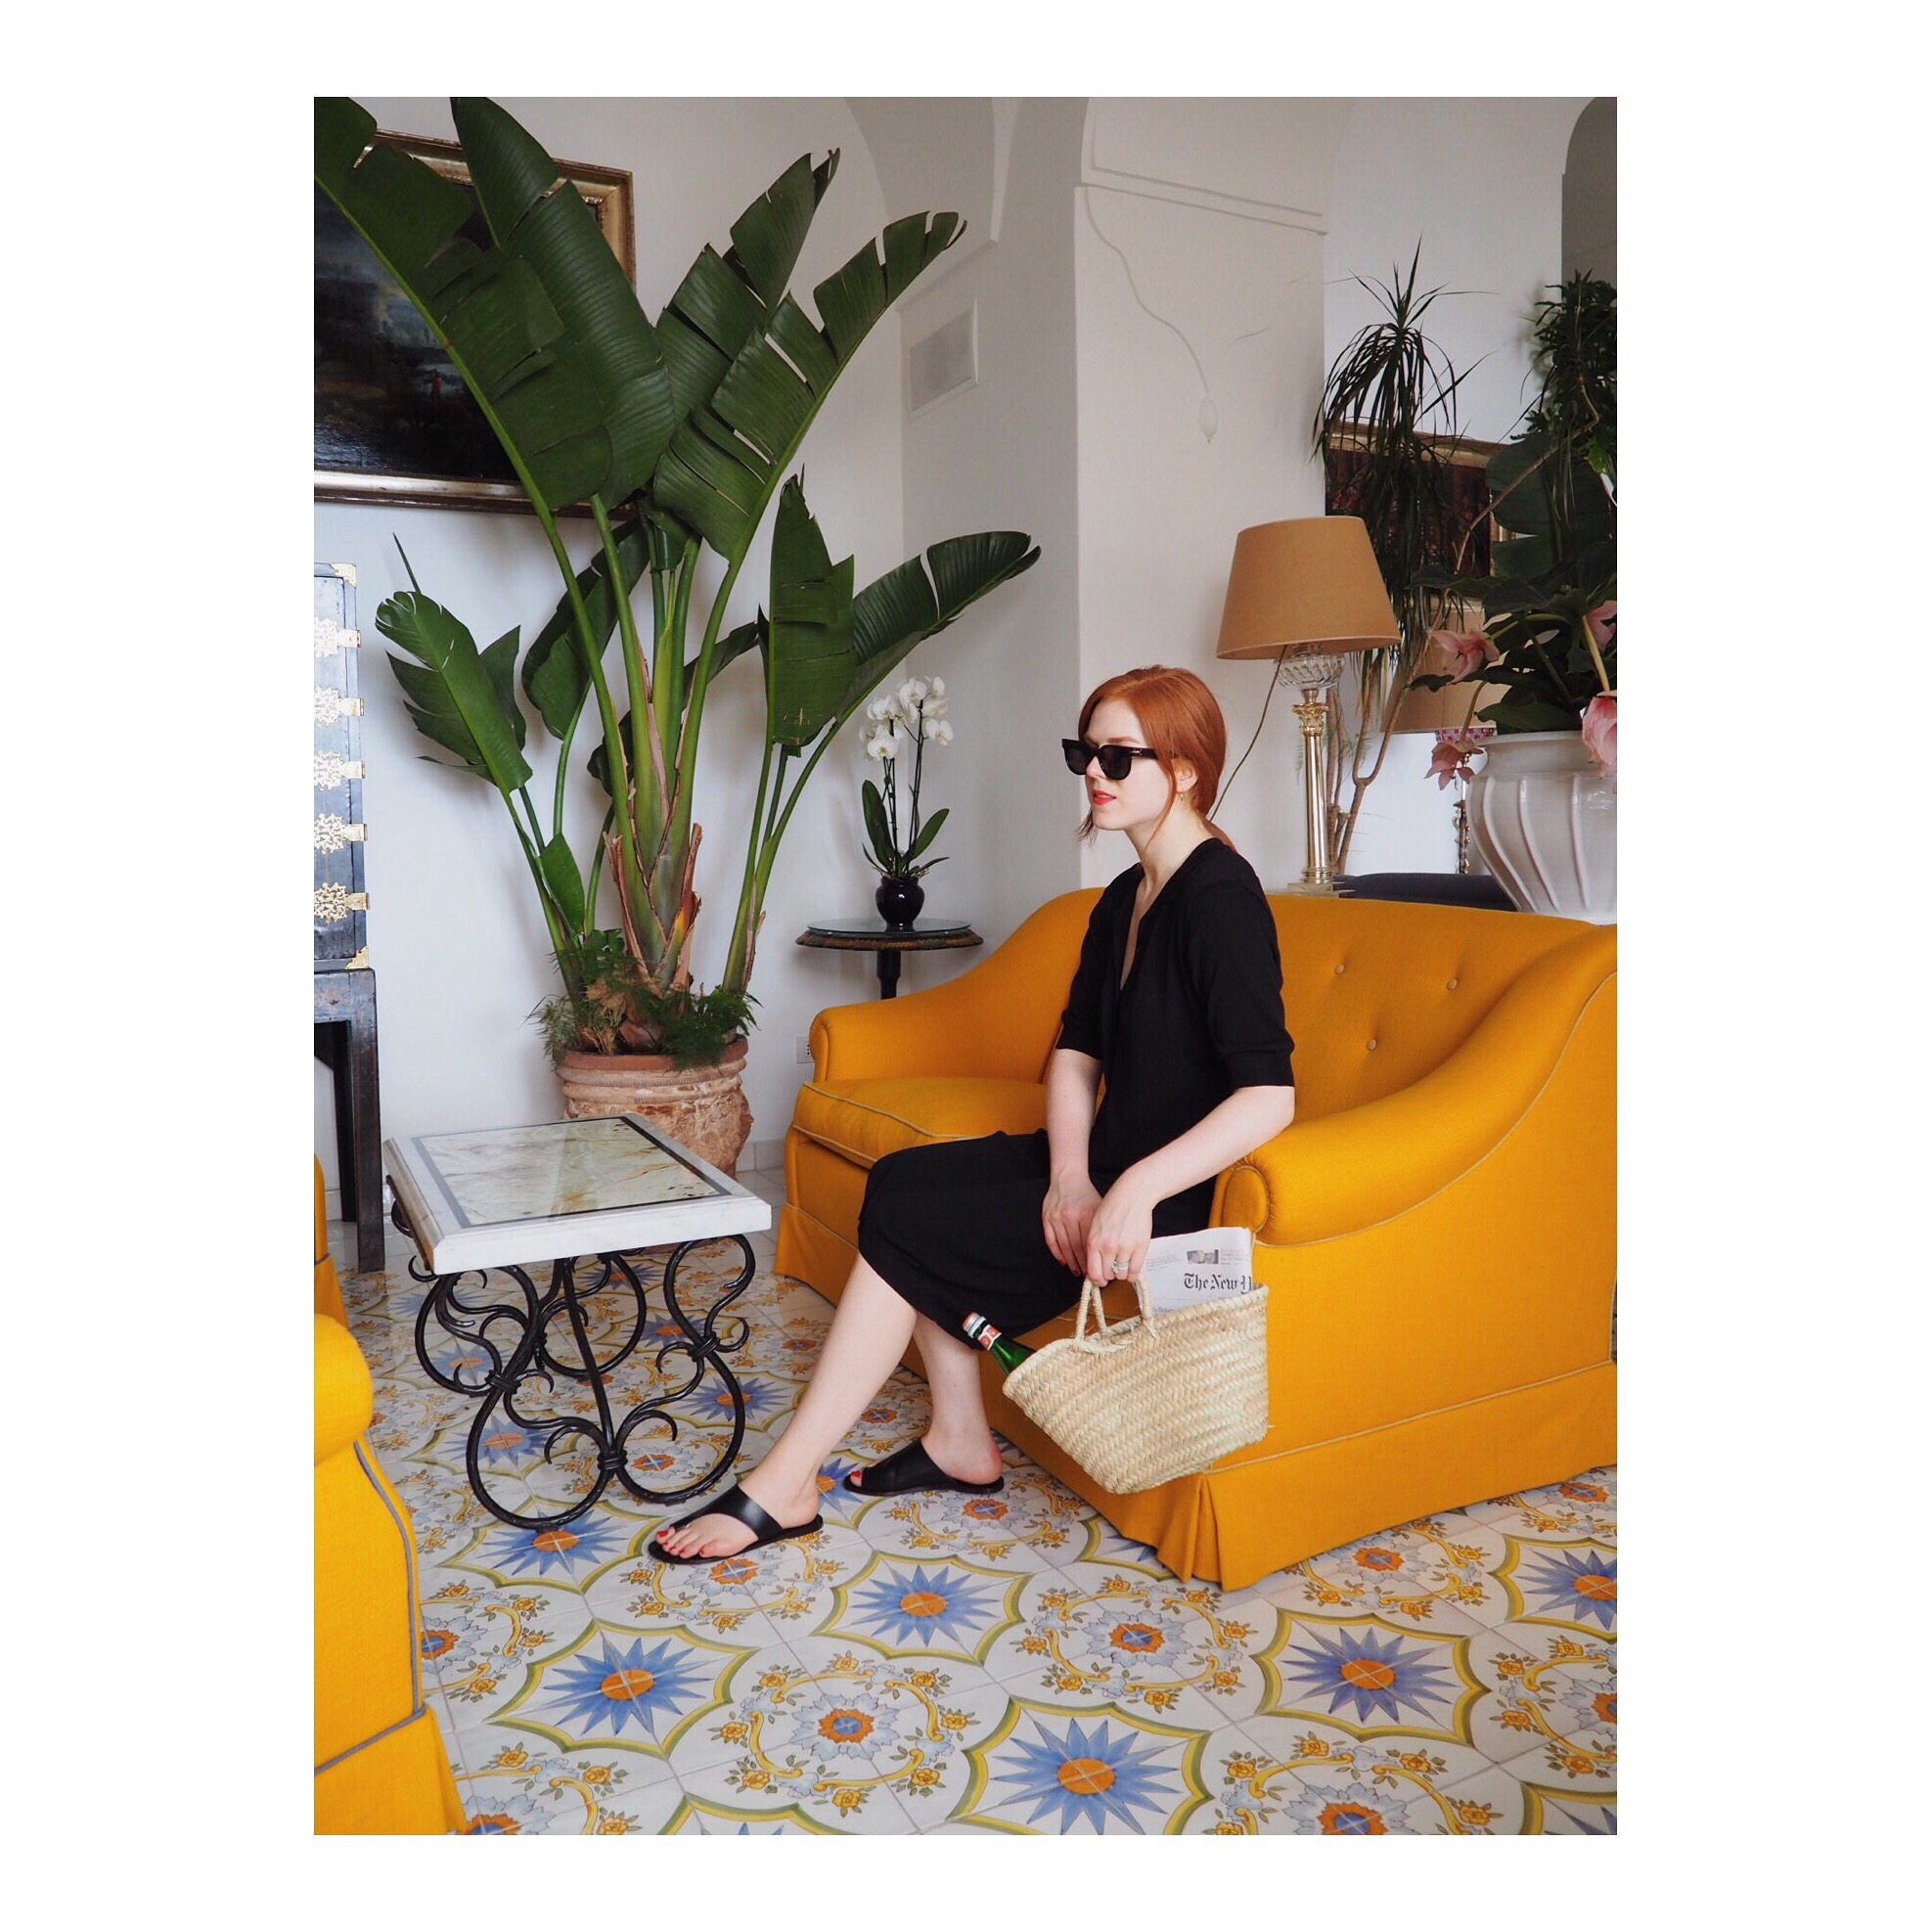 Toteme  knit dress,  Celine  sunglasses,  ATP Atelier  slides at Le Sirenuse